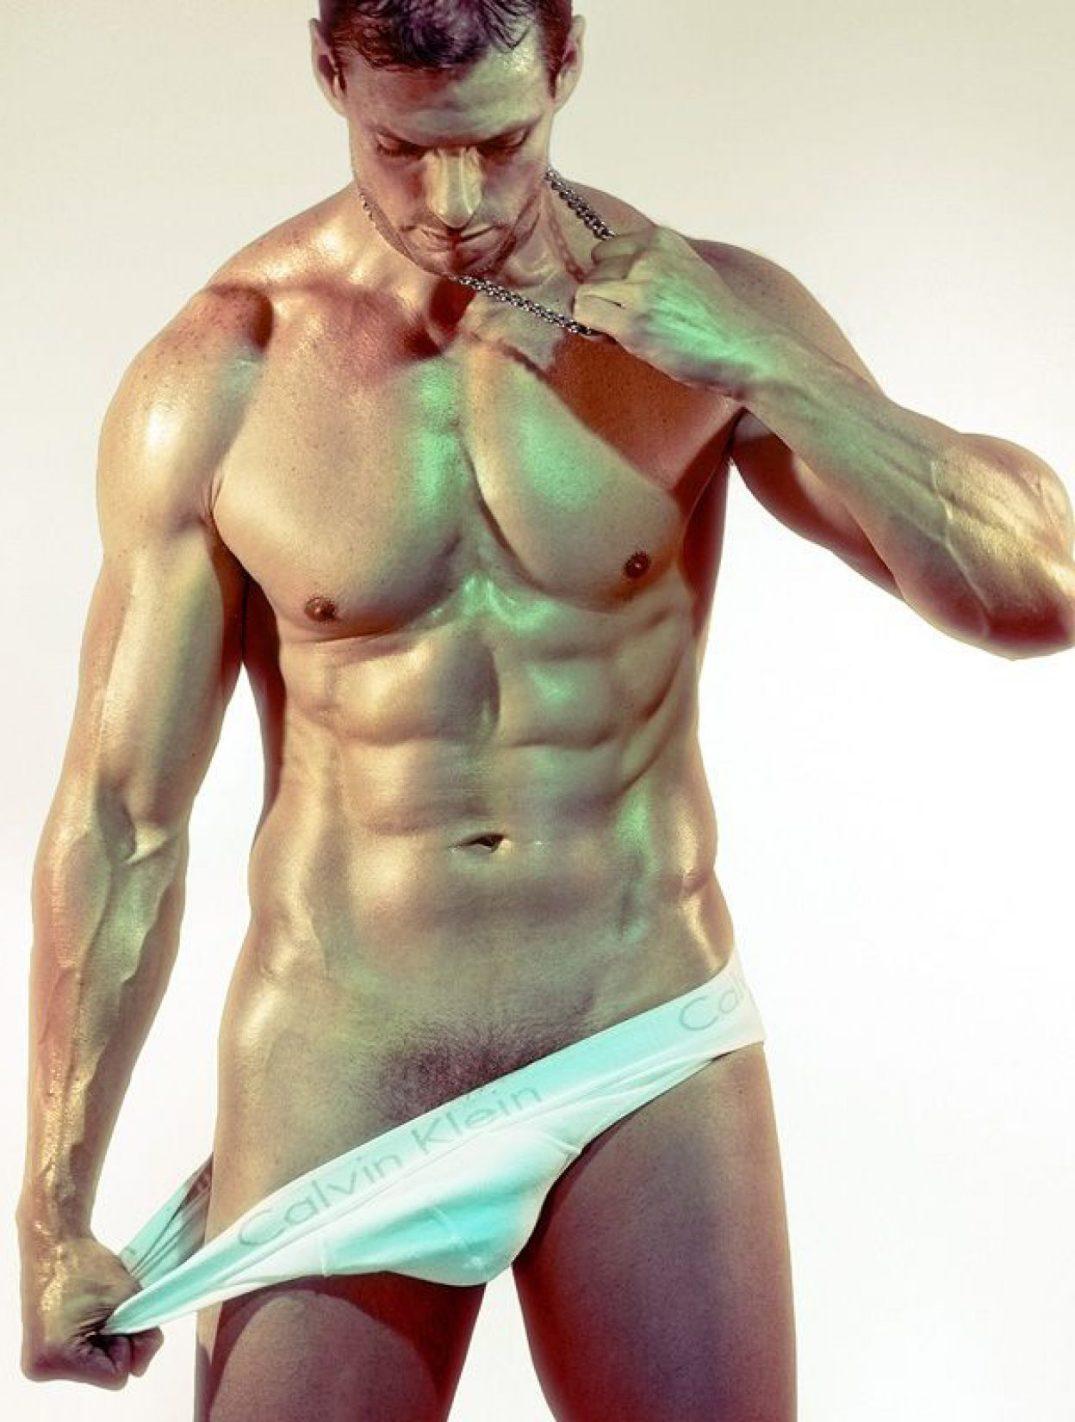 cropped-9ac0560e62afd81e6bf6ed102d702247-sexy-guys-anatomy.jpg